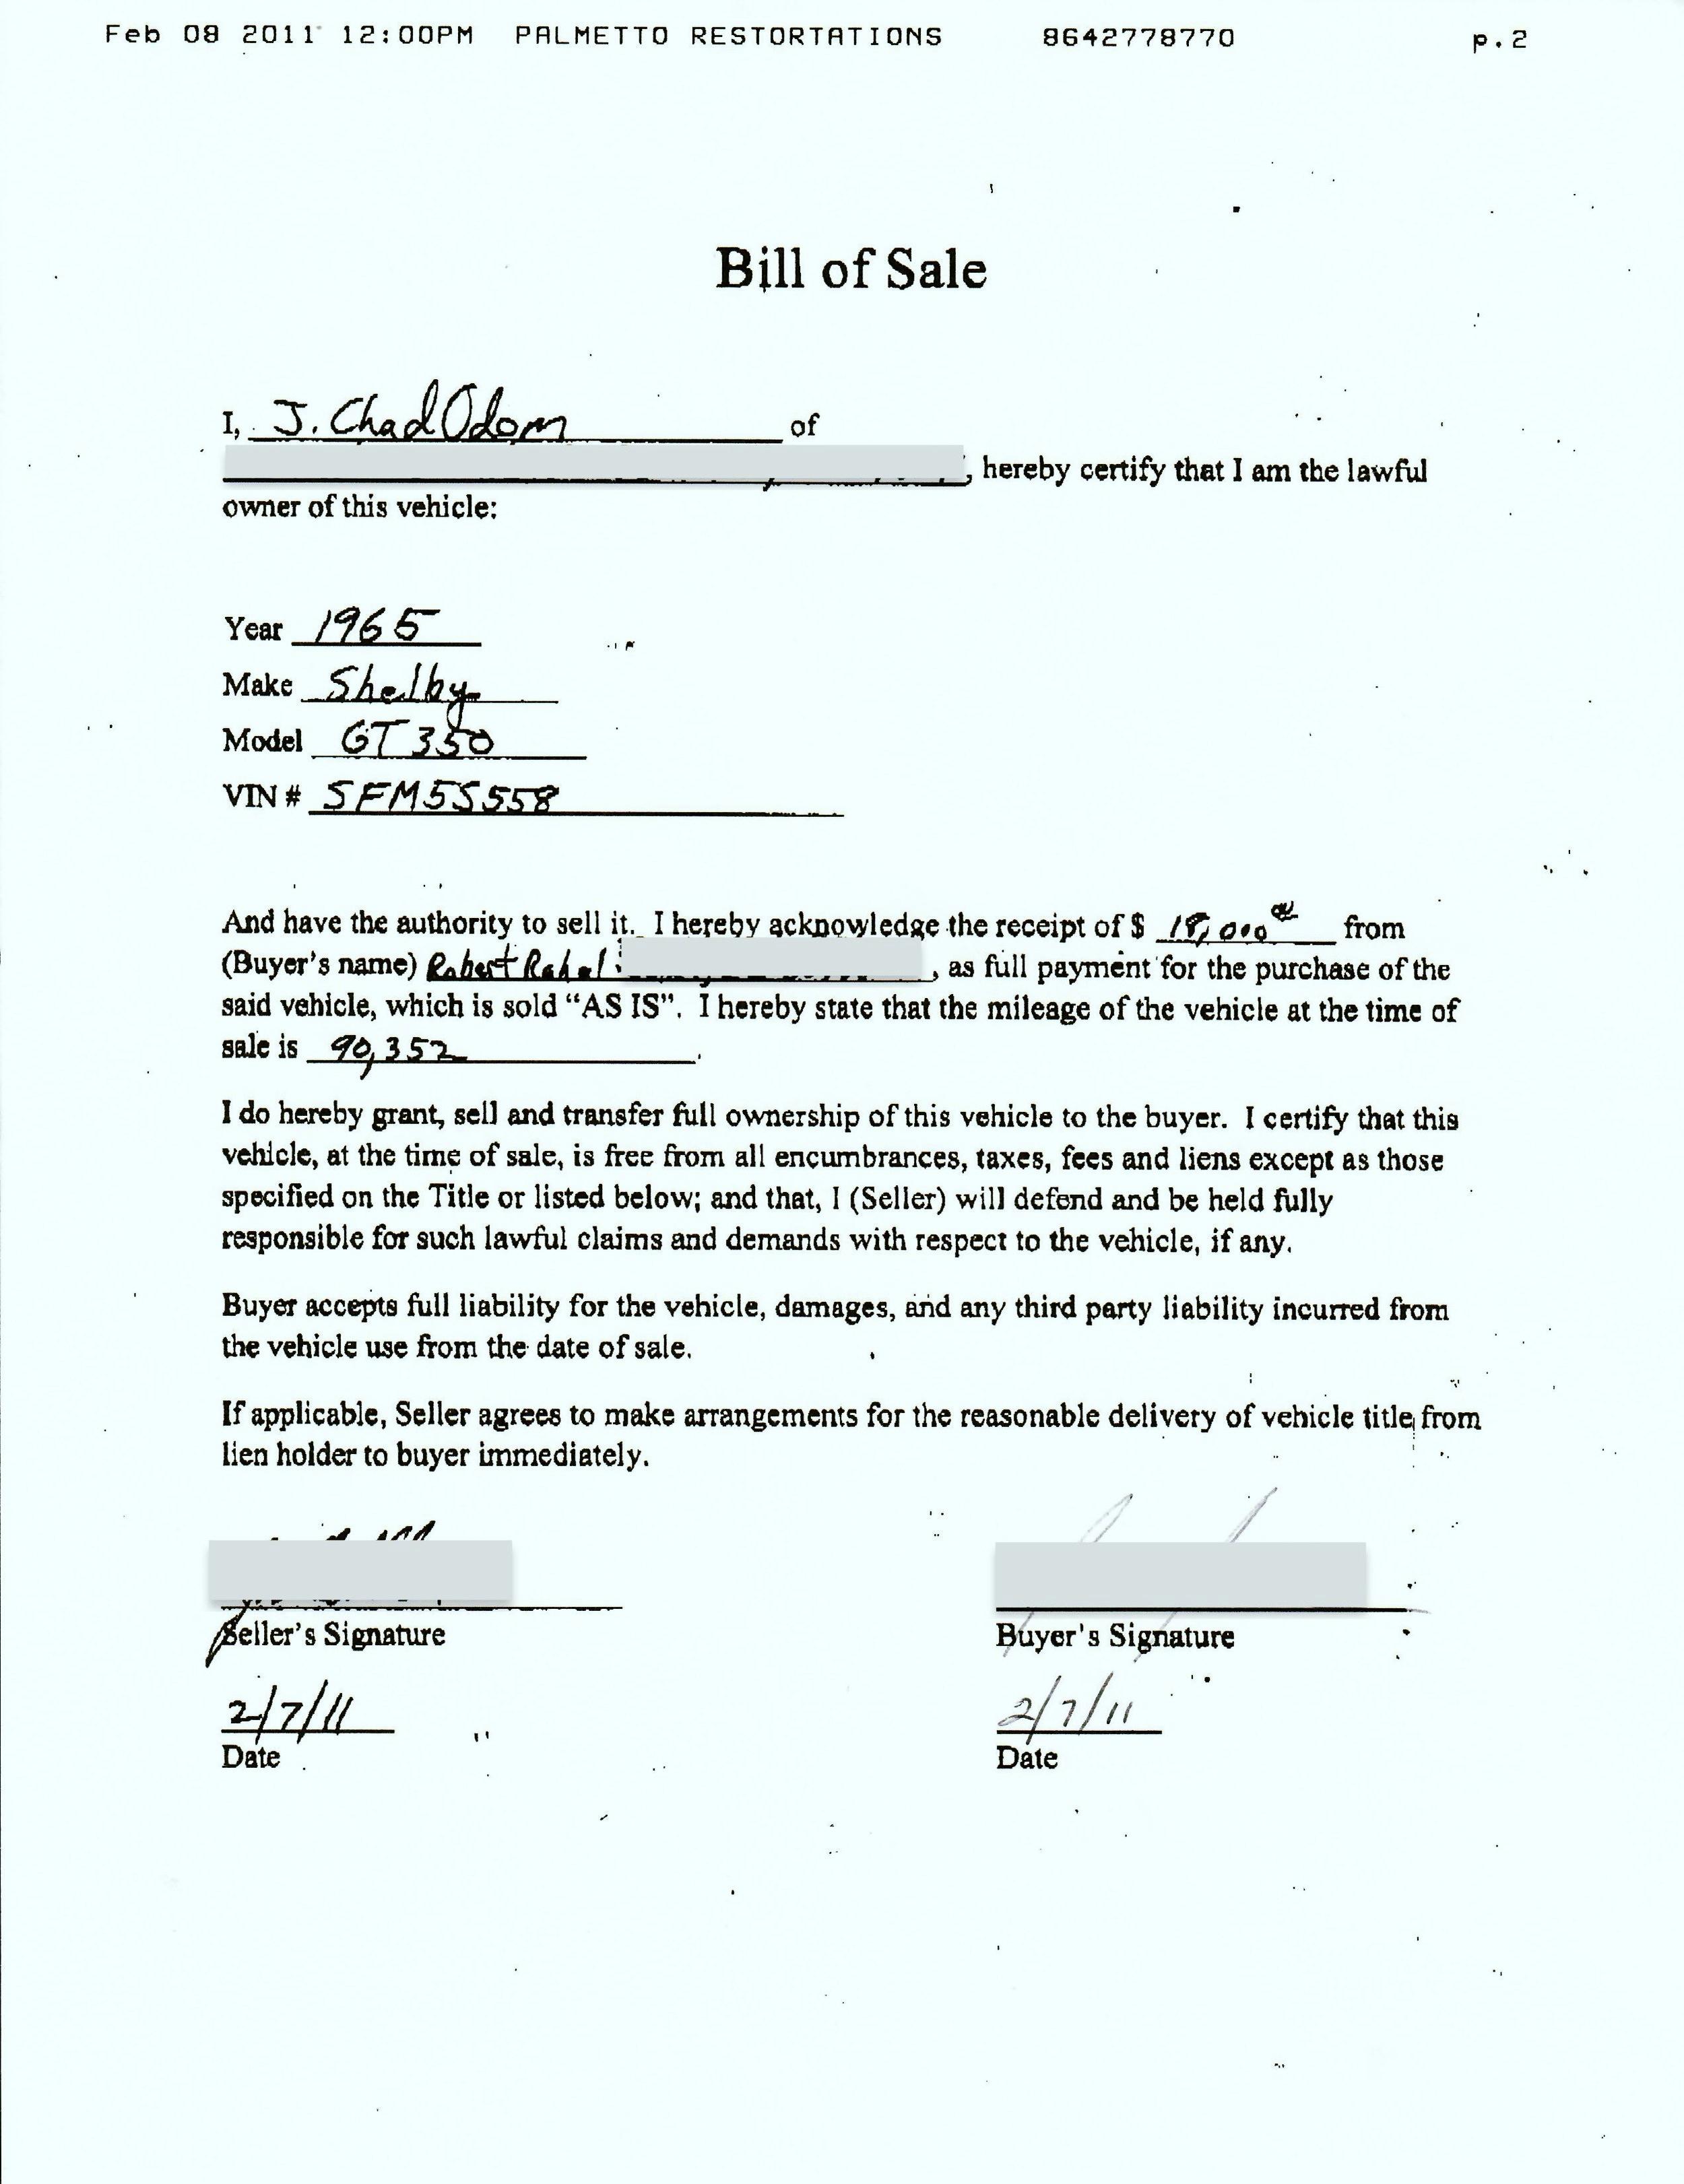 2011 Bill of Sale to Rahal.jpeg